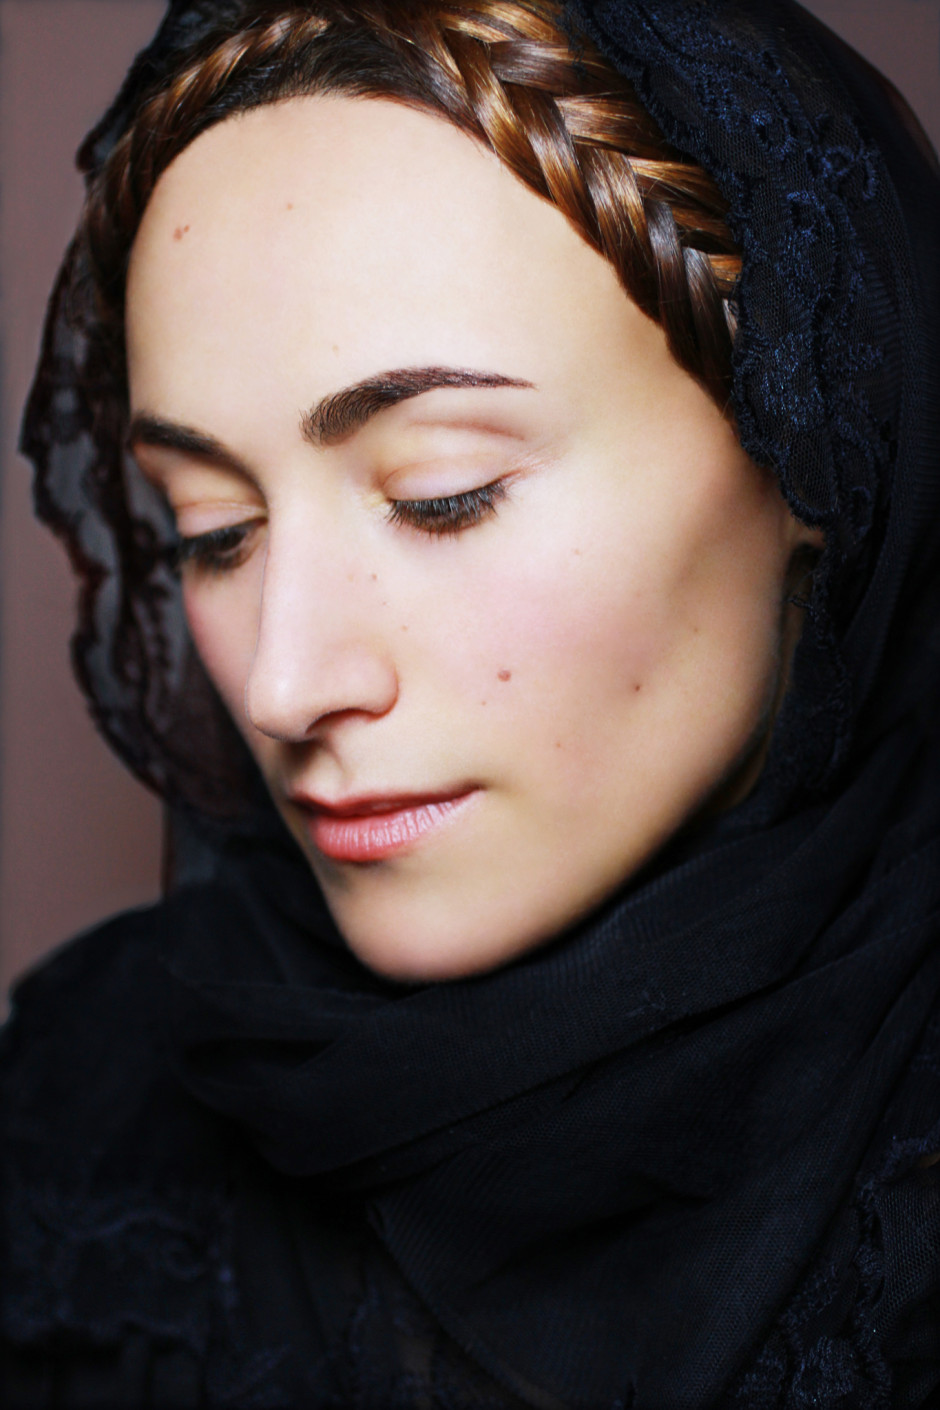 arijana-antje-taiga-jandrig-2014-02